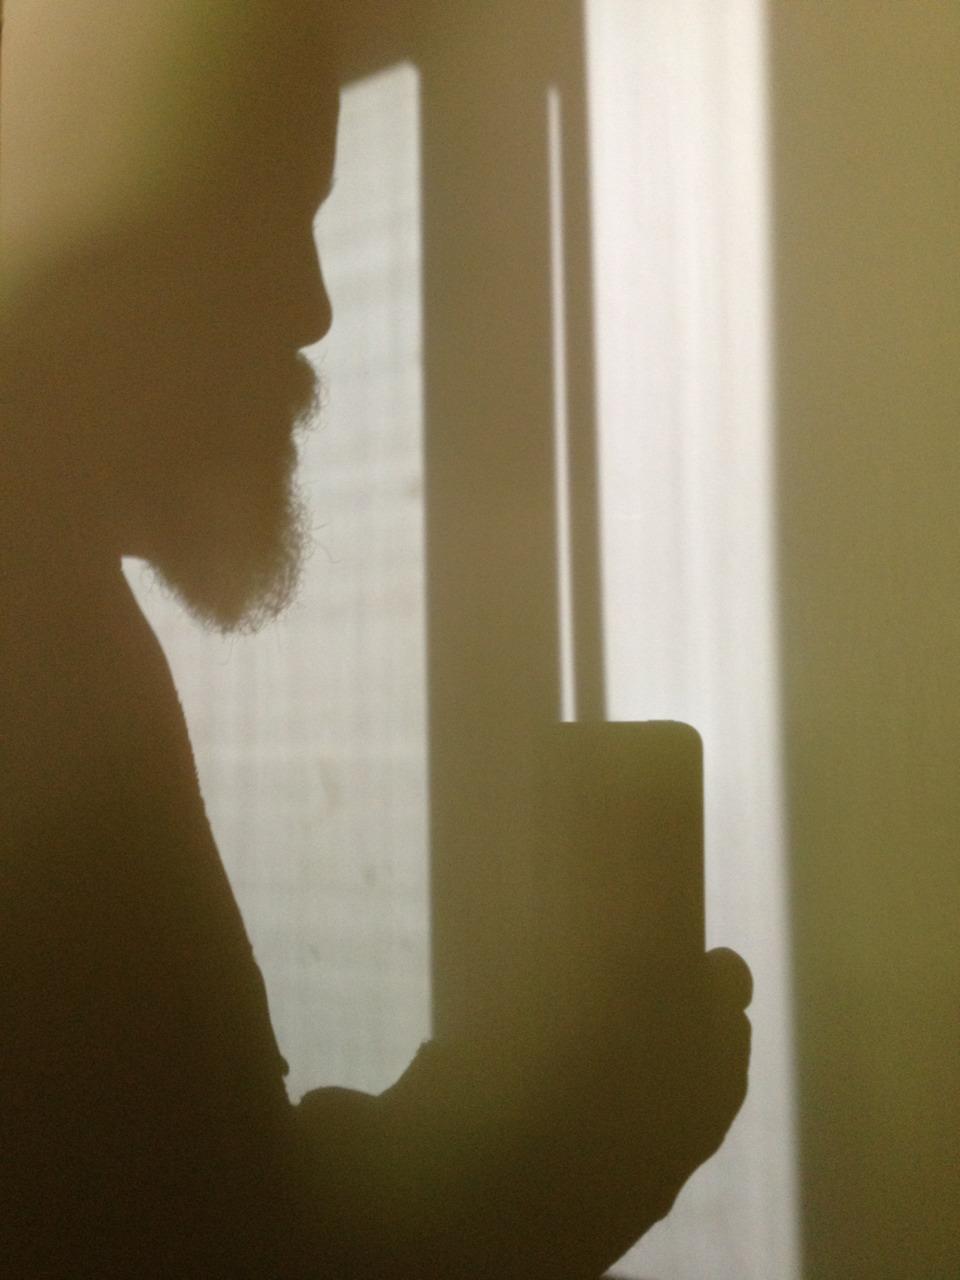 Silhouette selfie, because beard